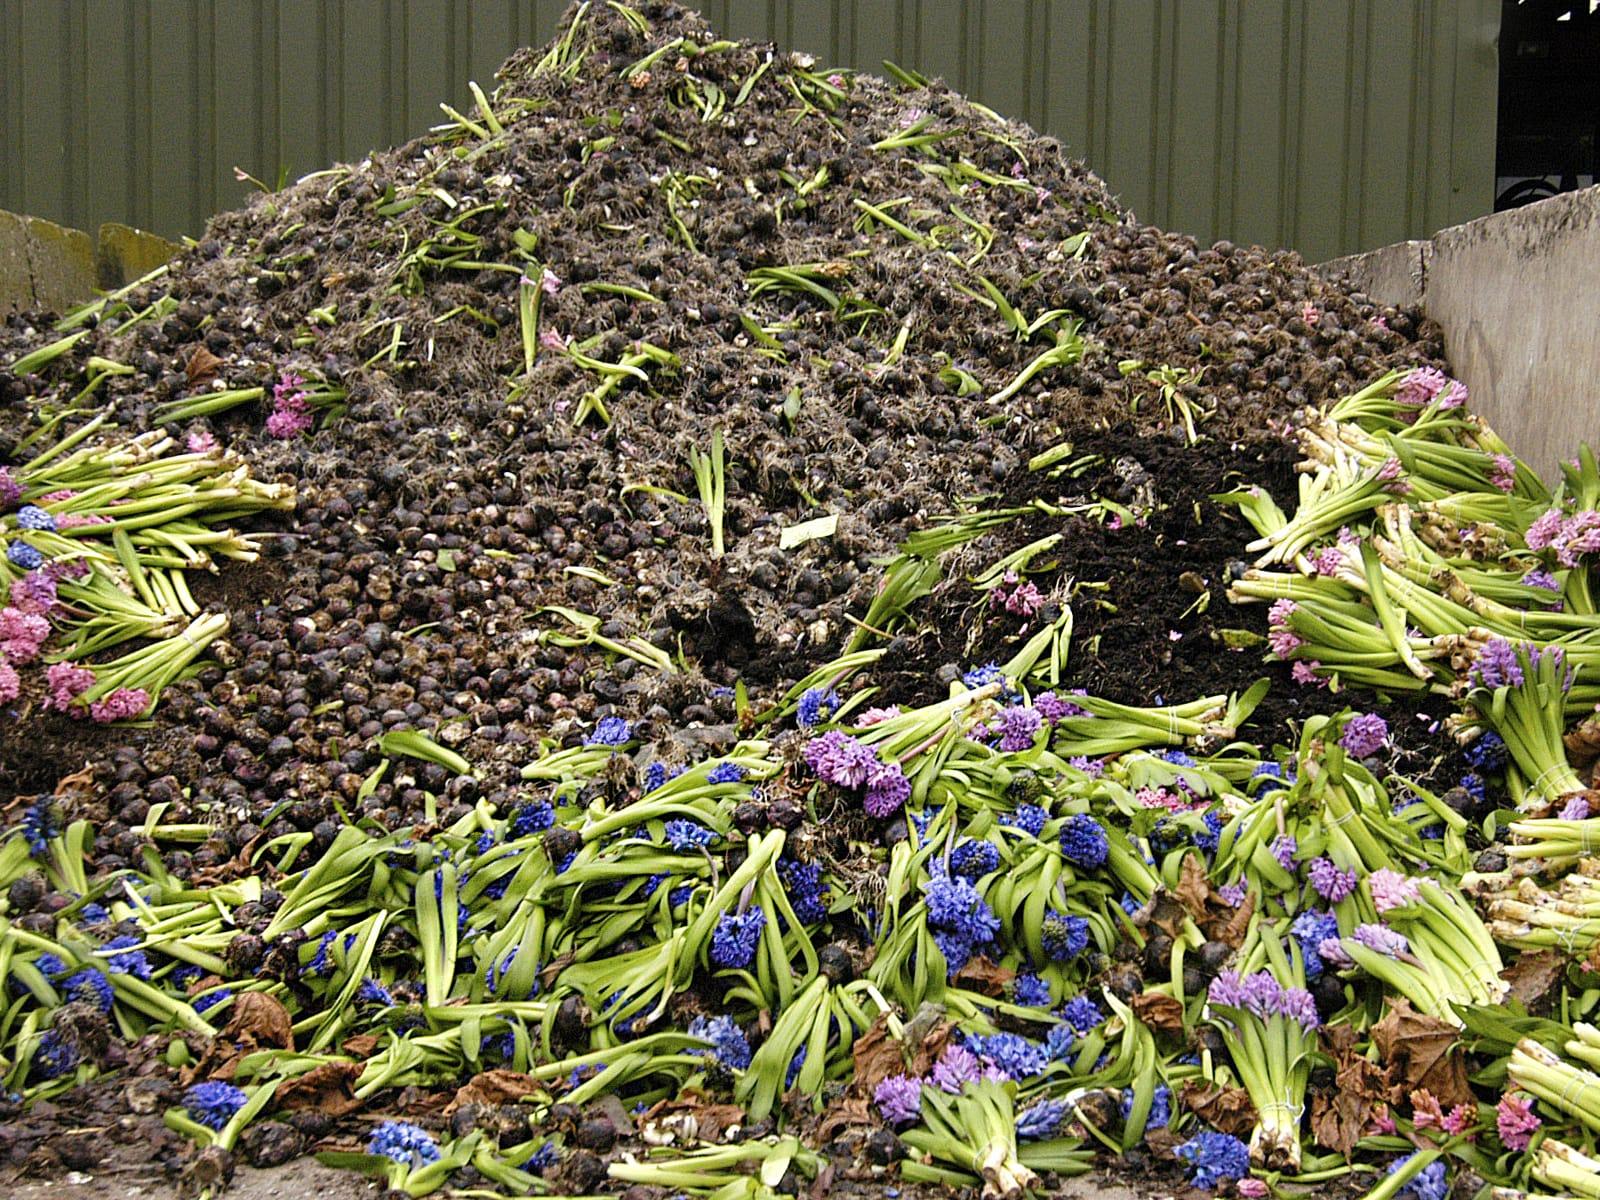 Reststromen-compost-greenportdb